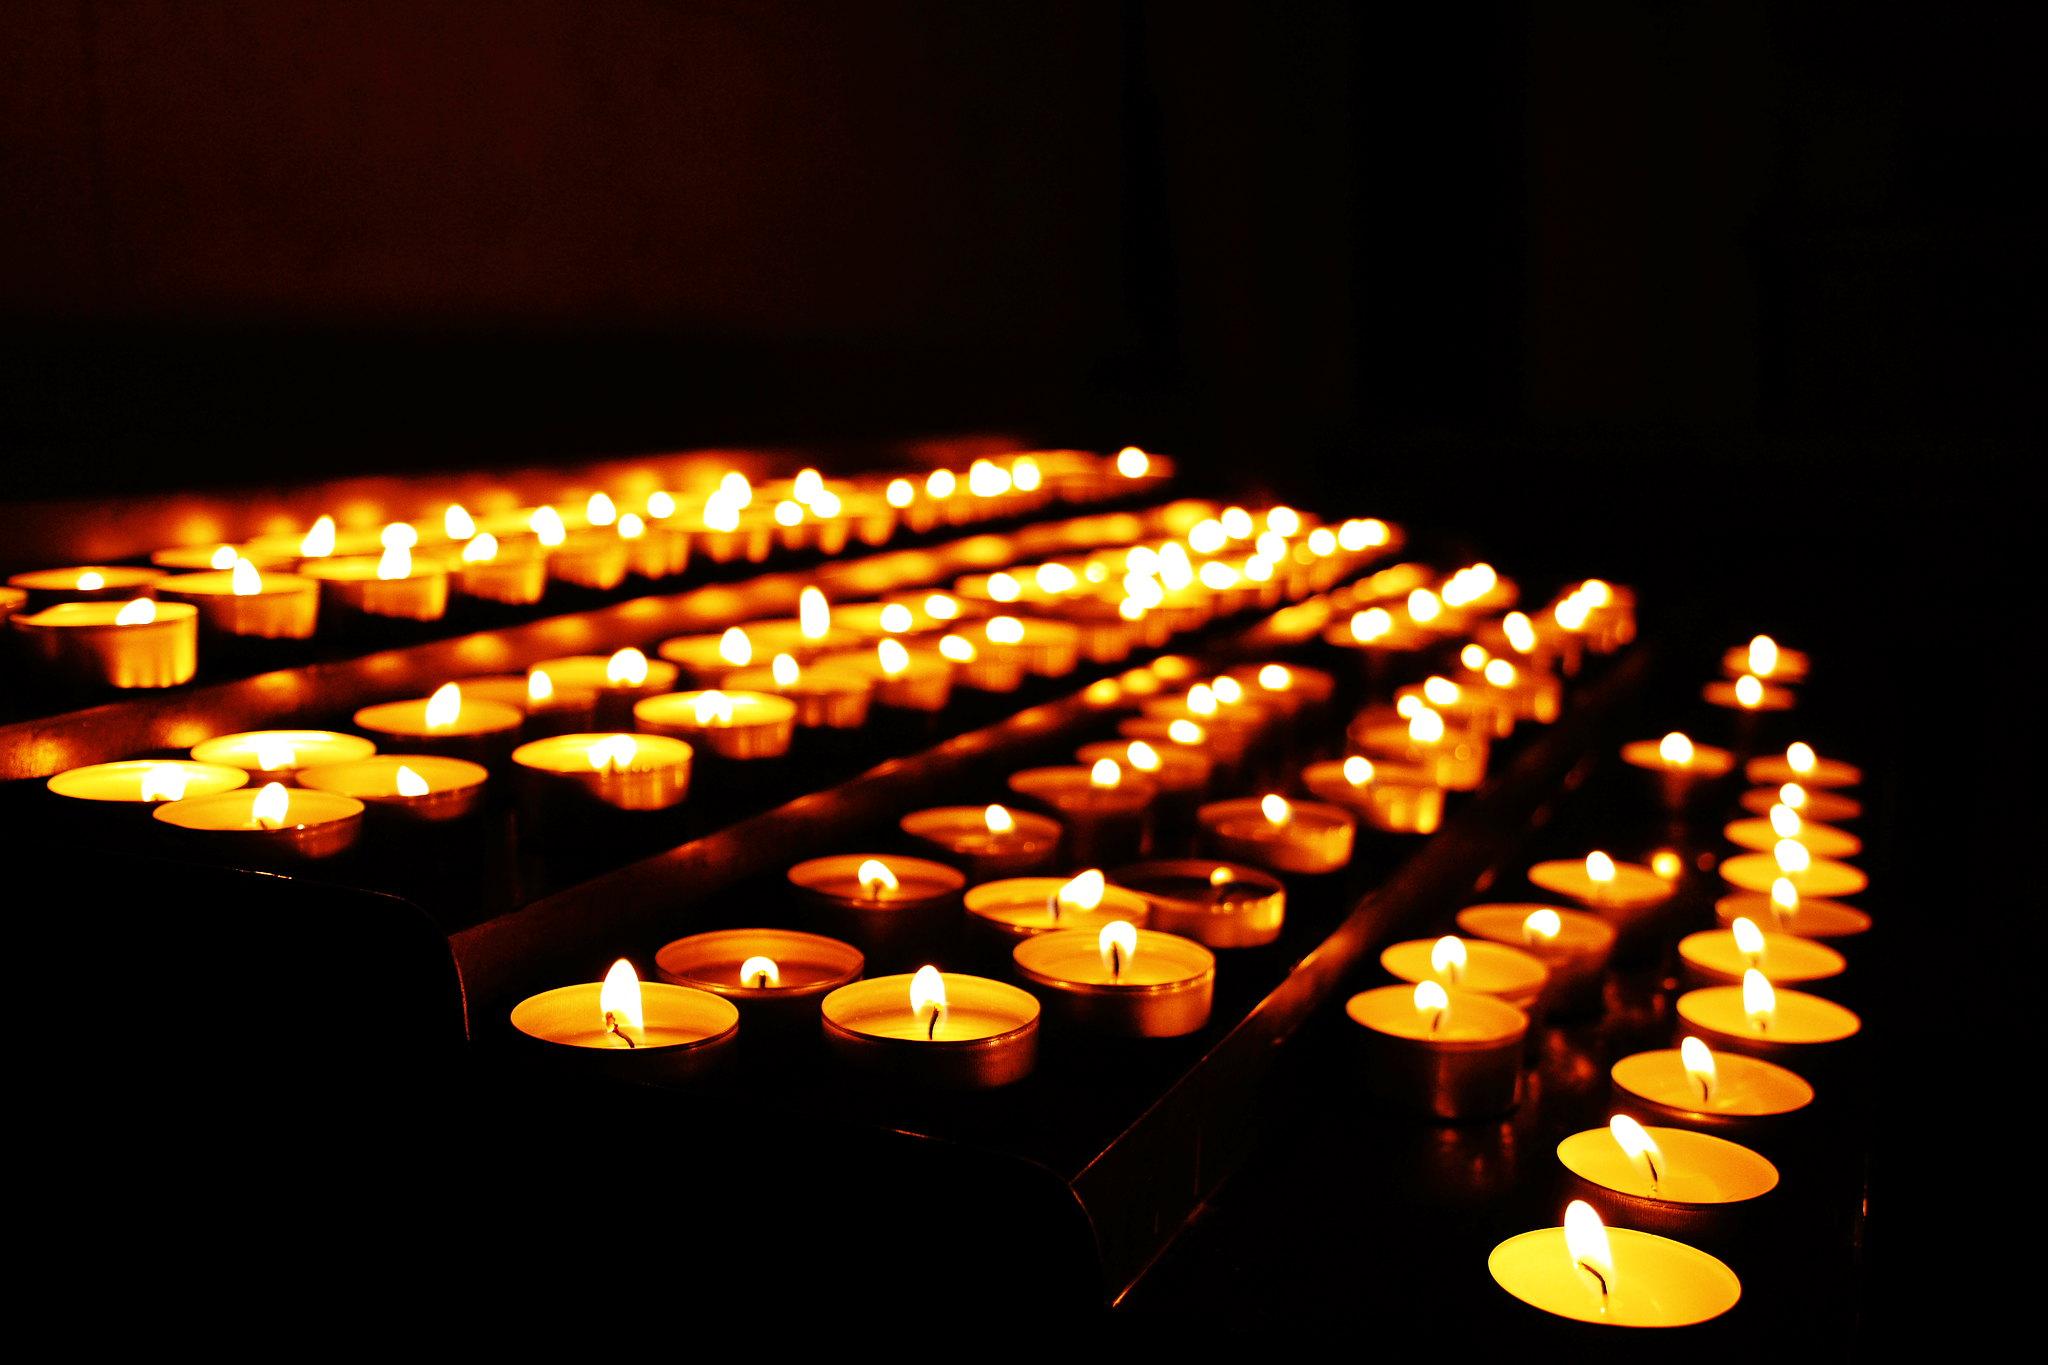 Prayers, galerie Flickr de Christian Oliver Harris